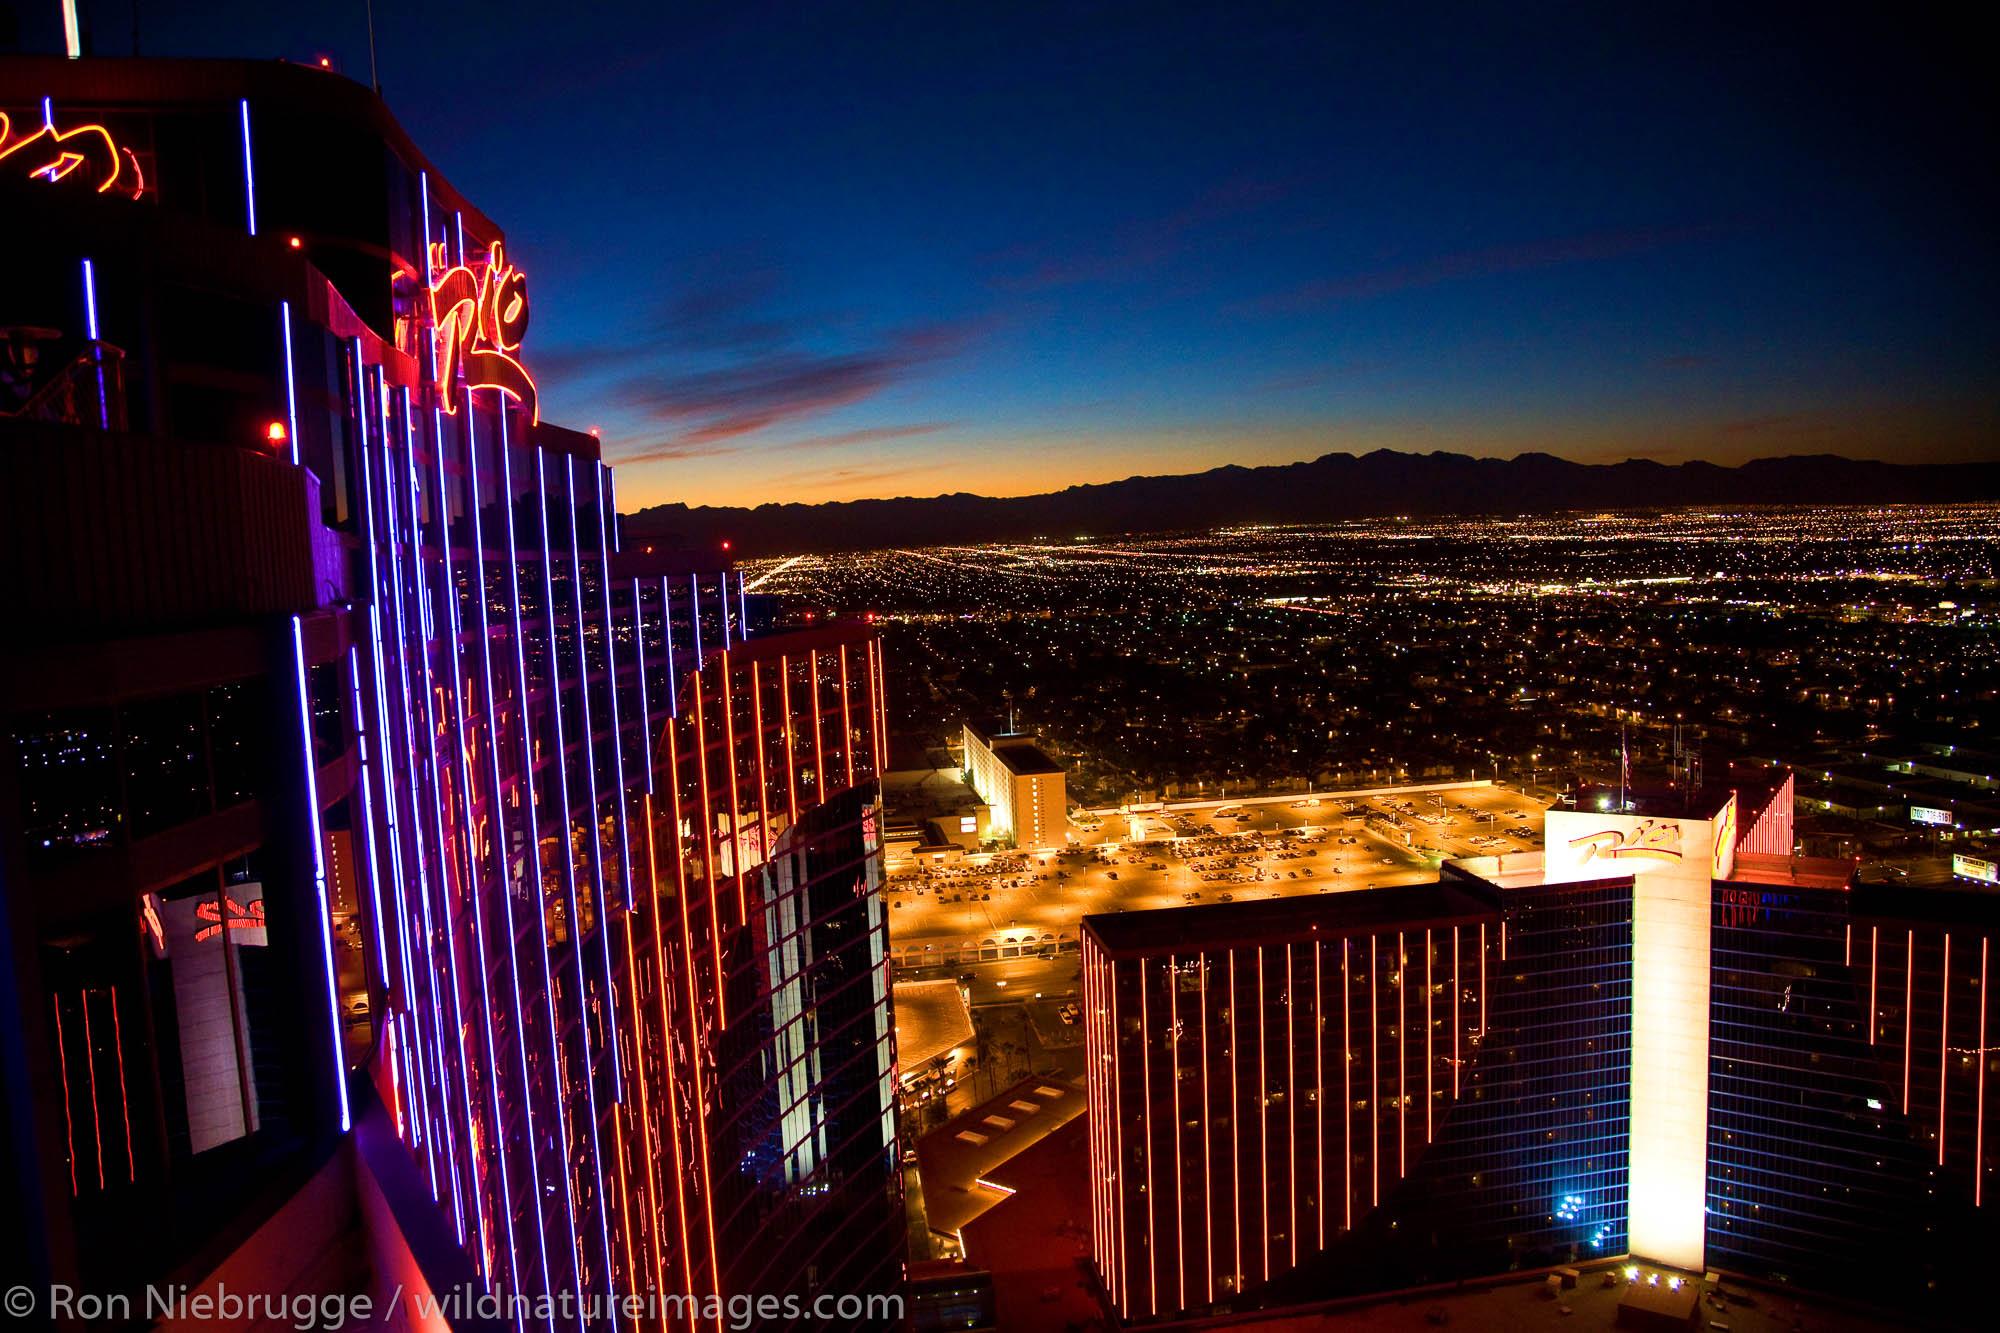 The Rio Hotel and Casino at night, Las Vegas, Nevada.